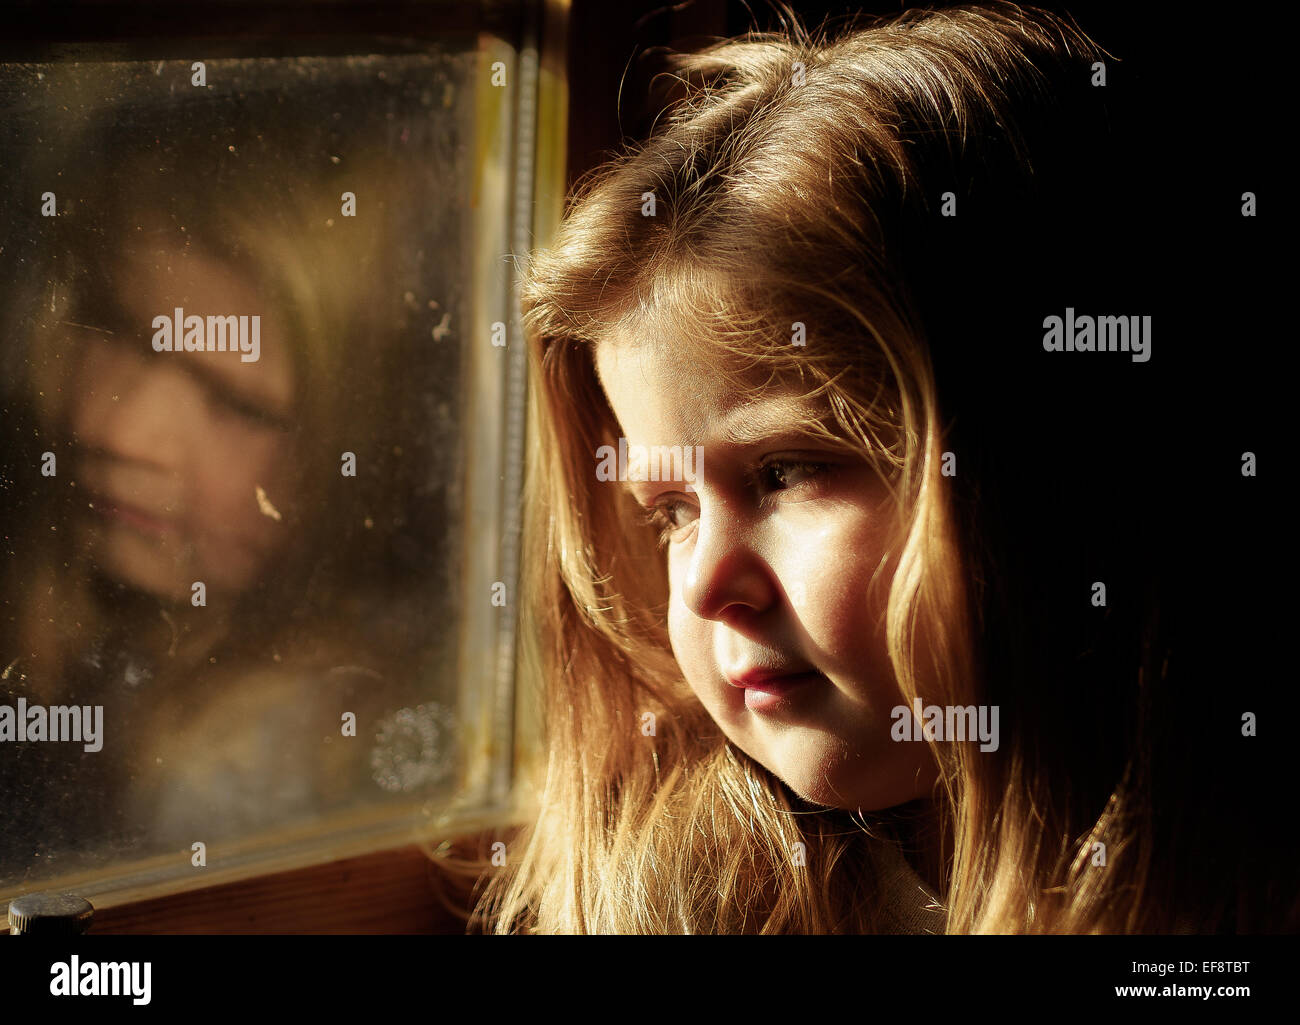 Portrait of girl sitting in train - Stock Image